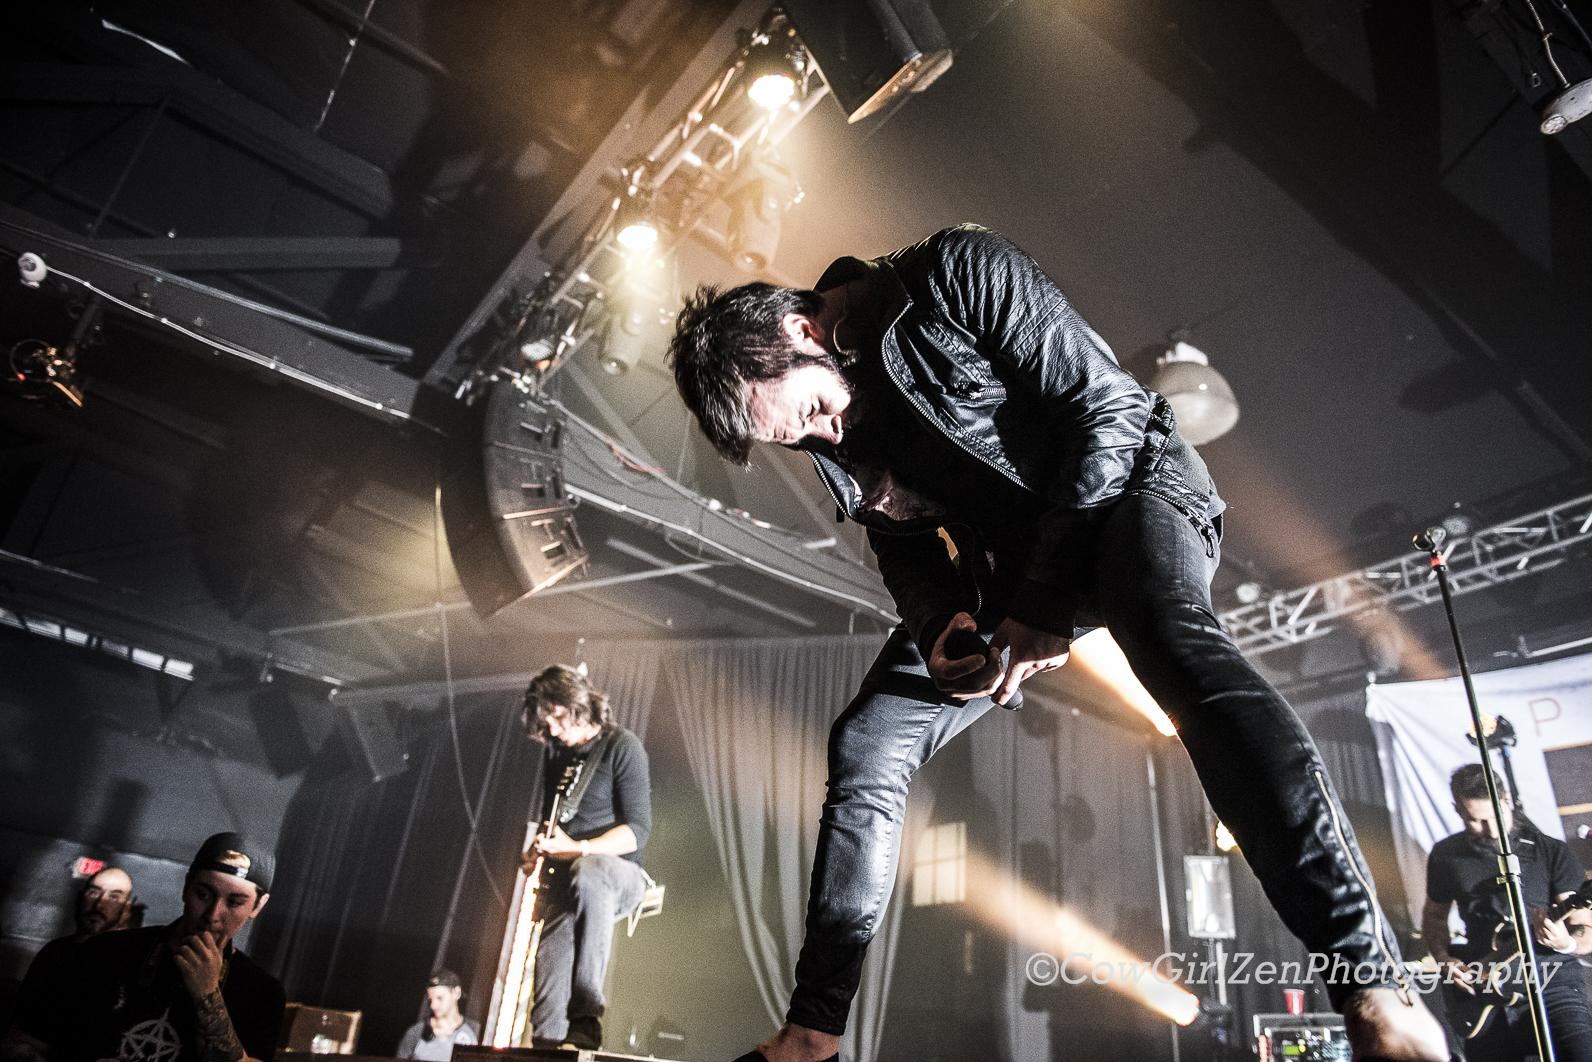 Live Music Photographer | Festival, Concert Photography ... |Live Concert Photography